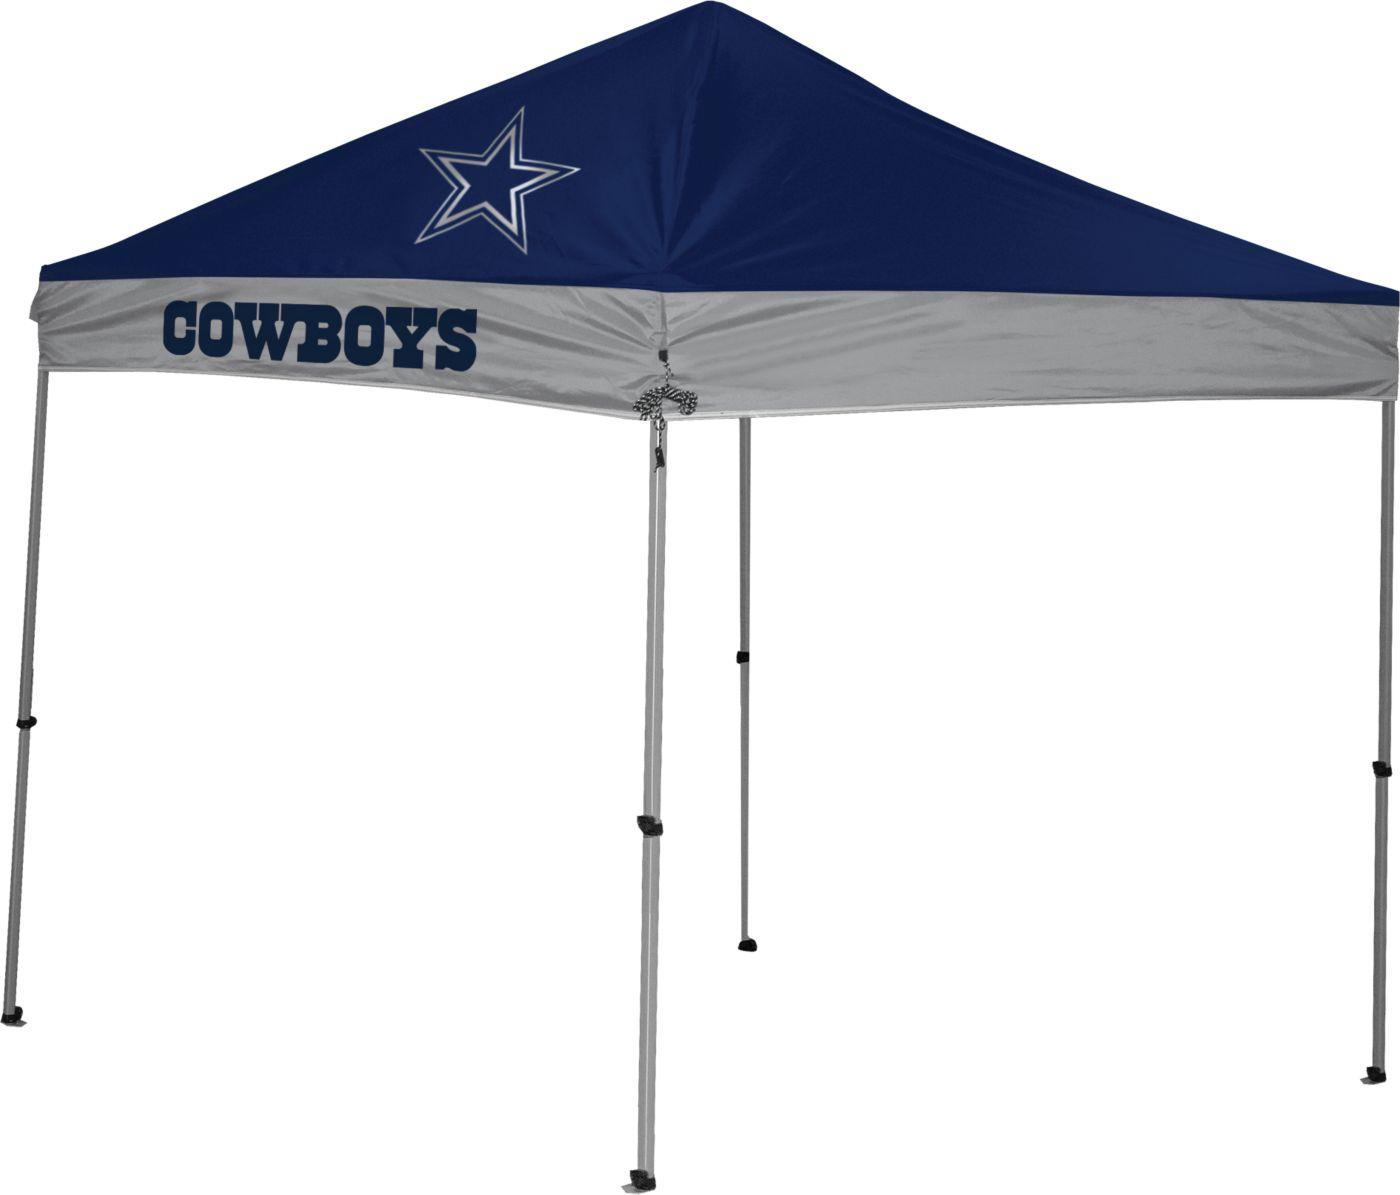 Rawlings Dallas Cowboys 9'x9' Canopy Tent